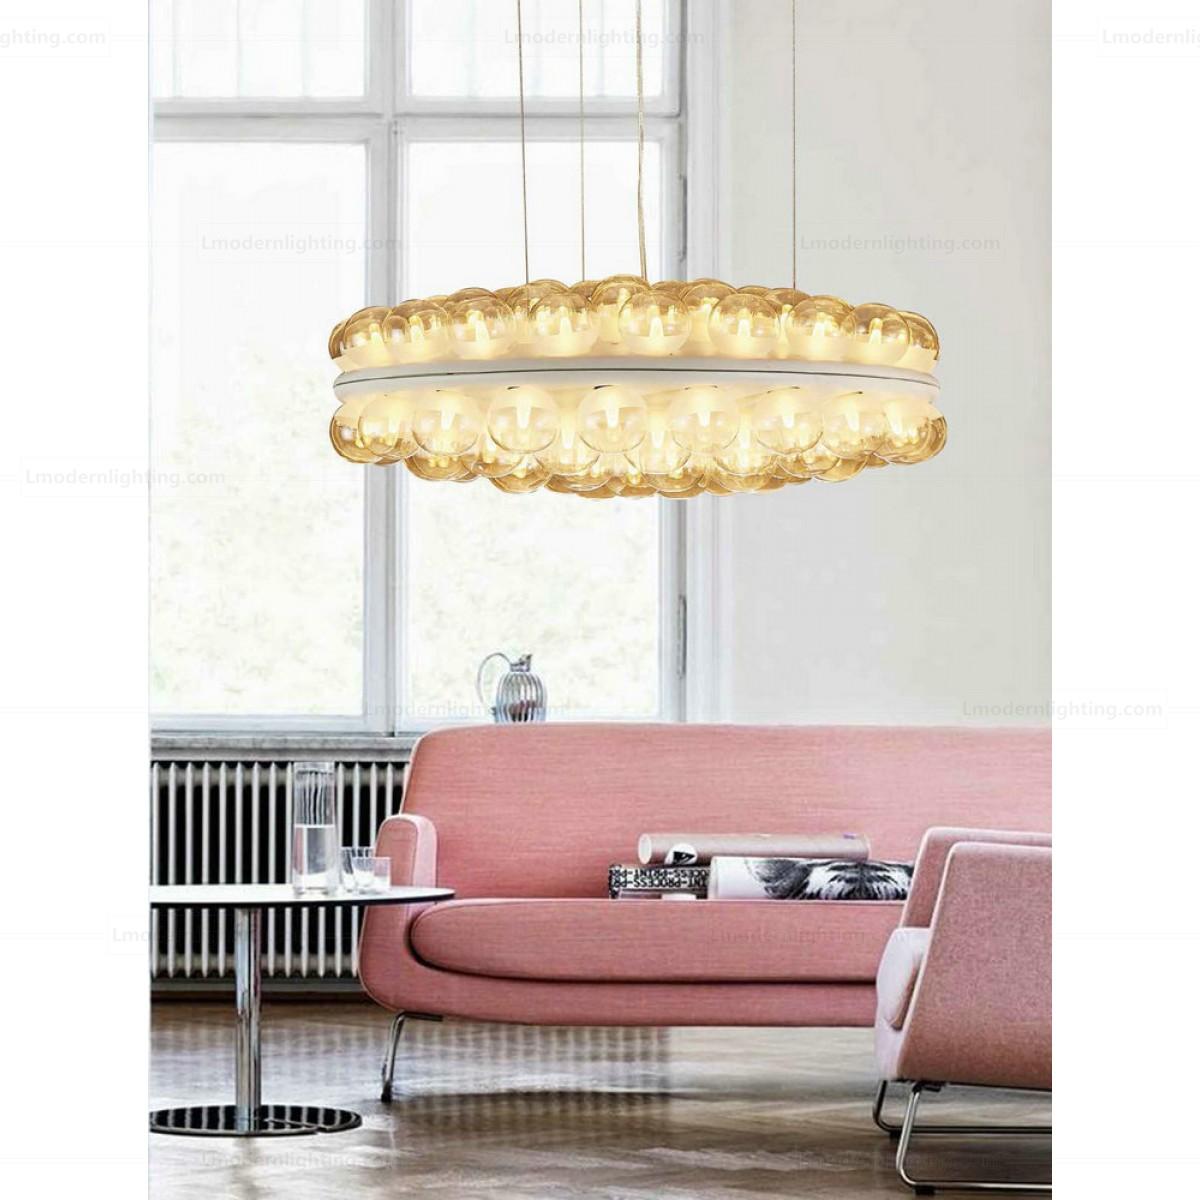 Prop Light Round Suspension Lamp Double Version